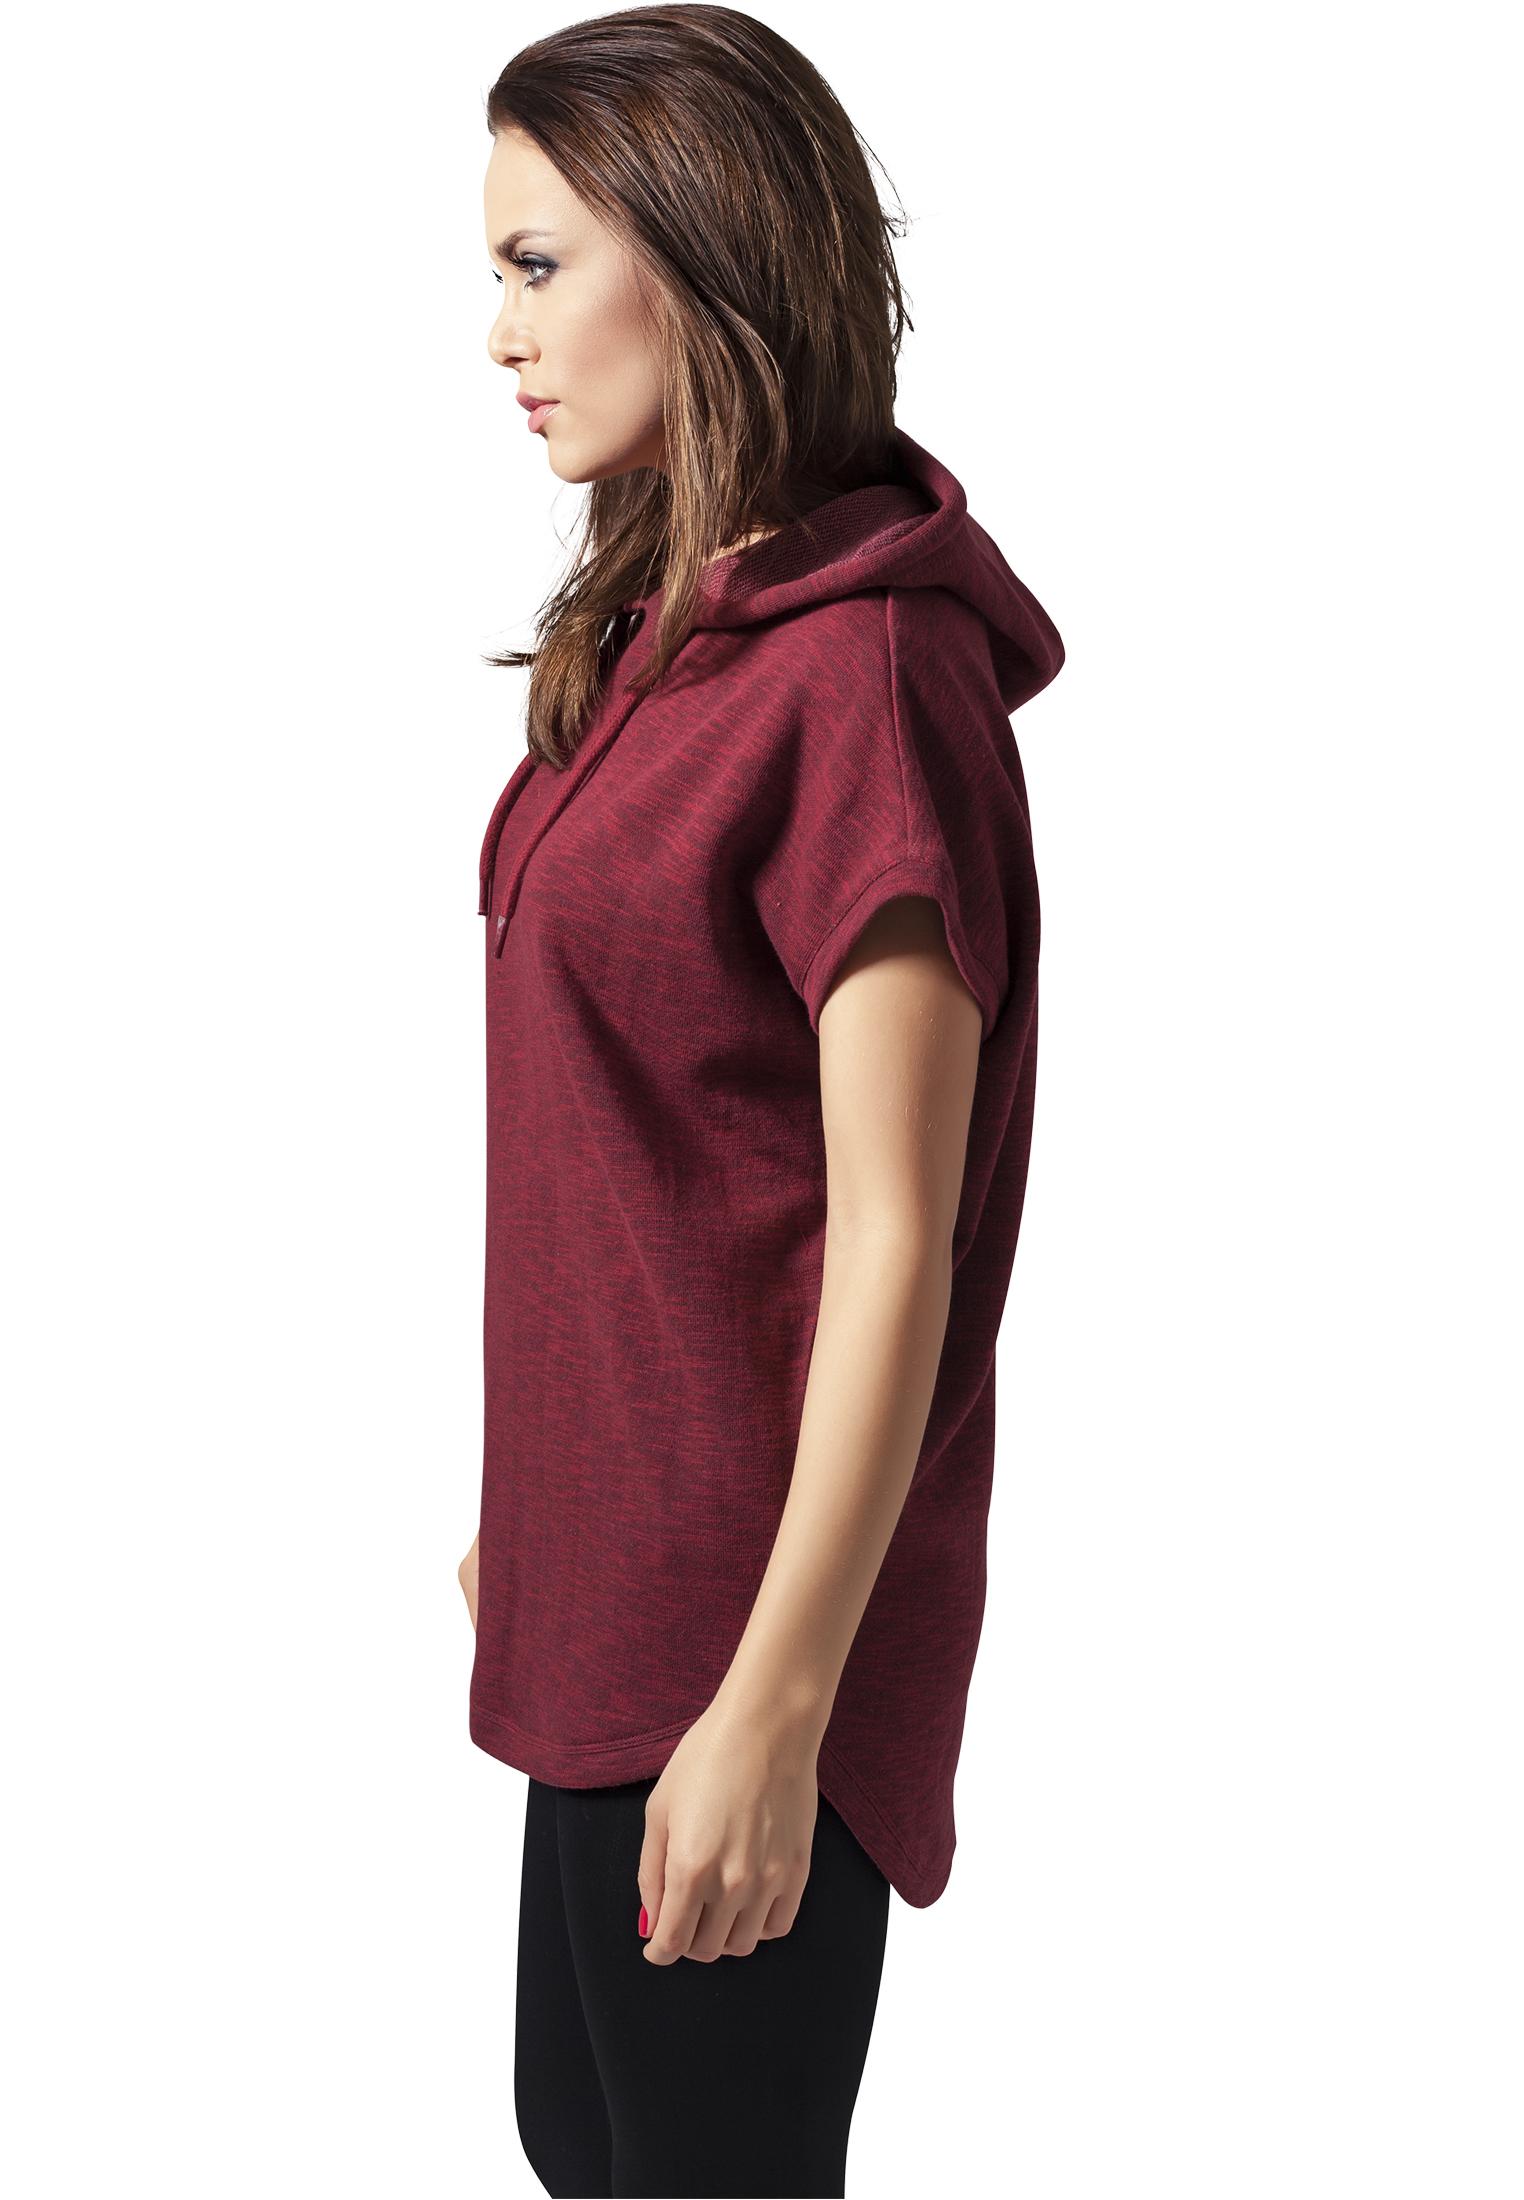 Urban Classics Damen Kapuzenpullover Hoodie Sweatshirt Melange Terry Hoody